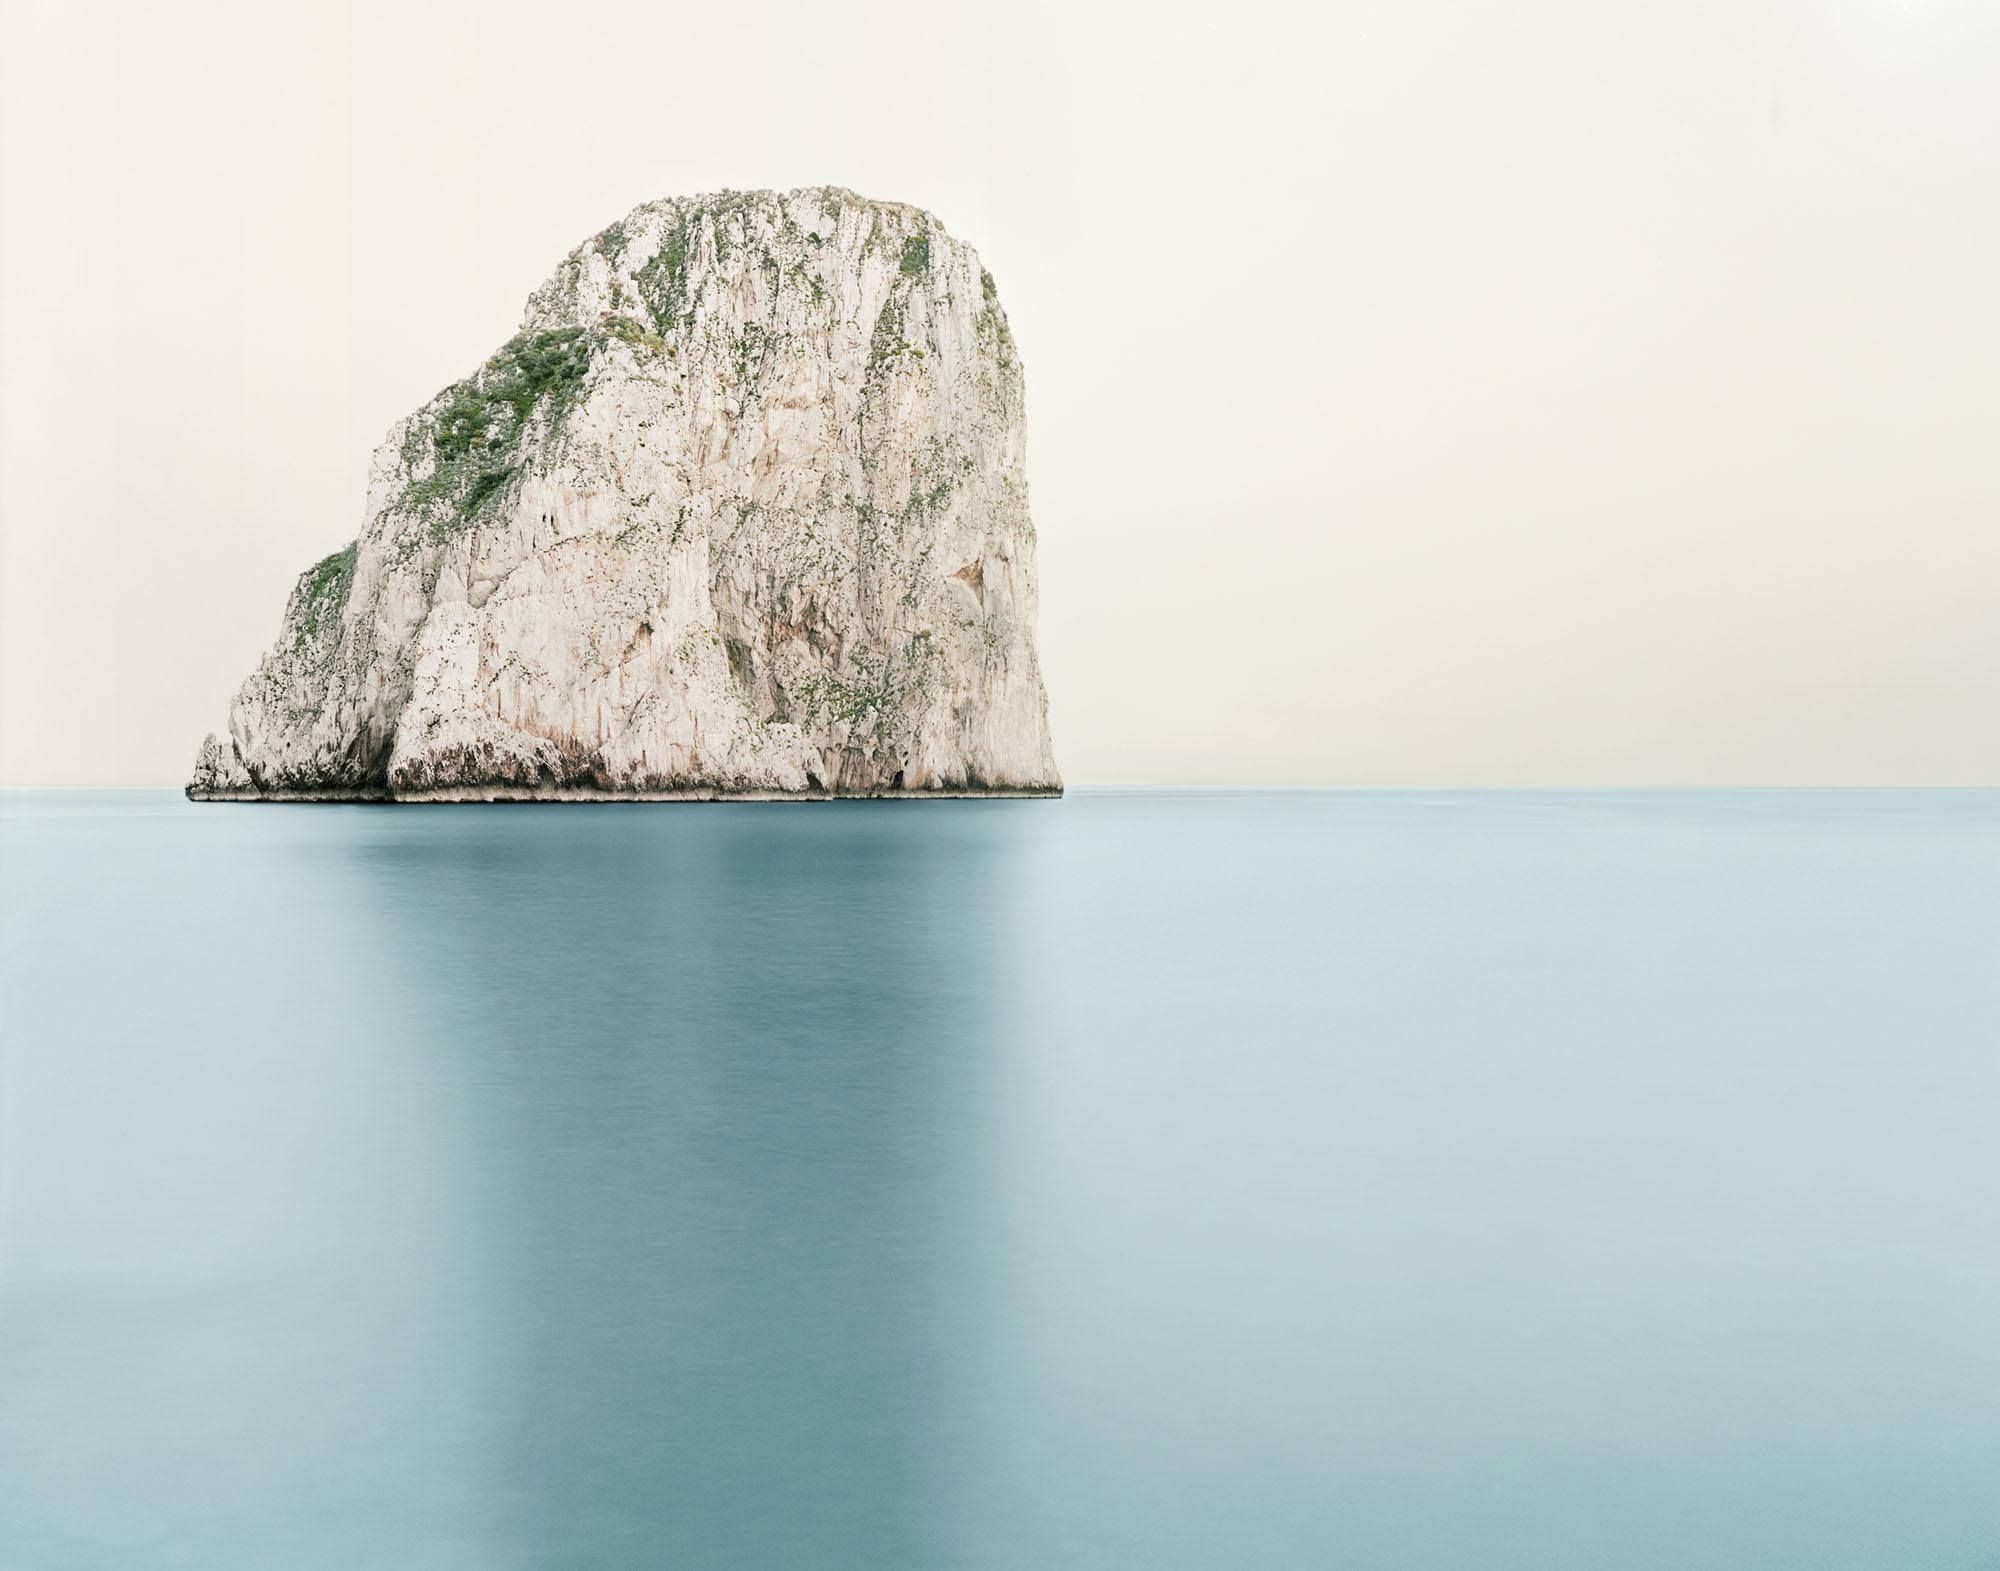 by Francesco Jodice